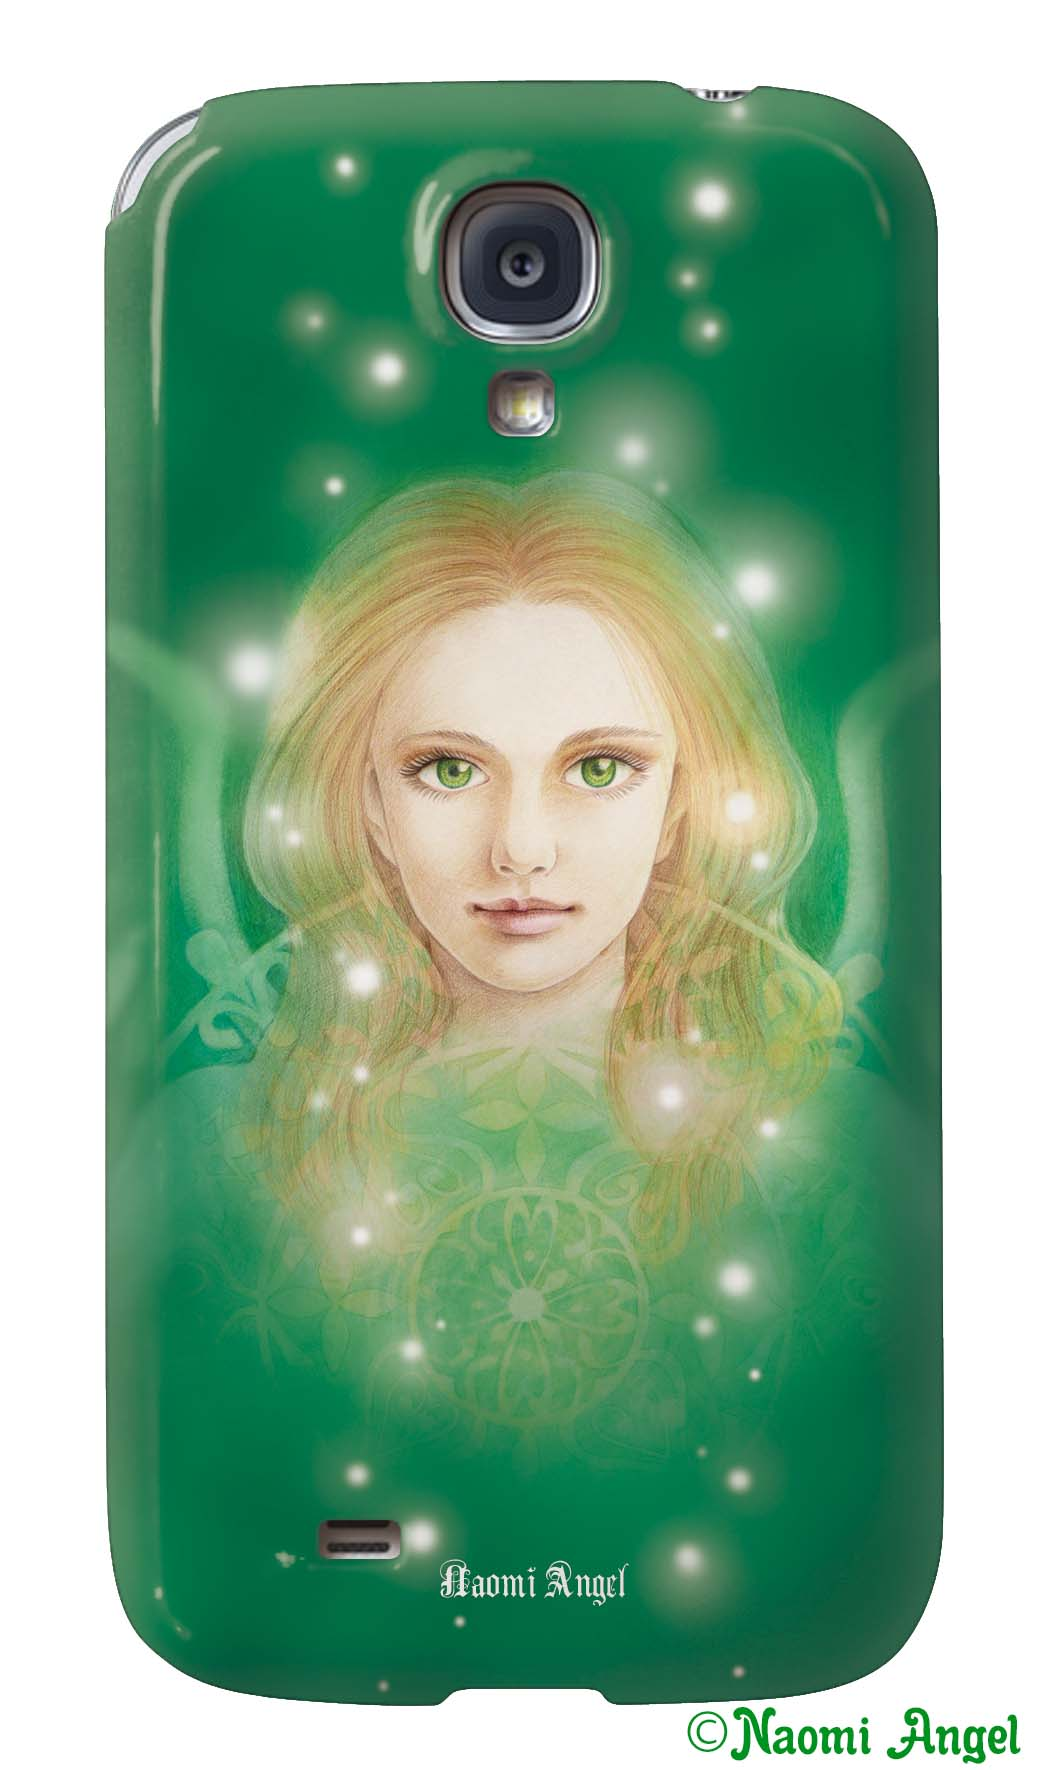 Naomi Angel オリジナルスマートフォンカバー ネット販売開始_f0186787_21202146.jpg